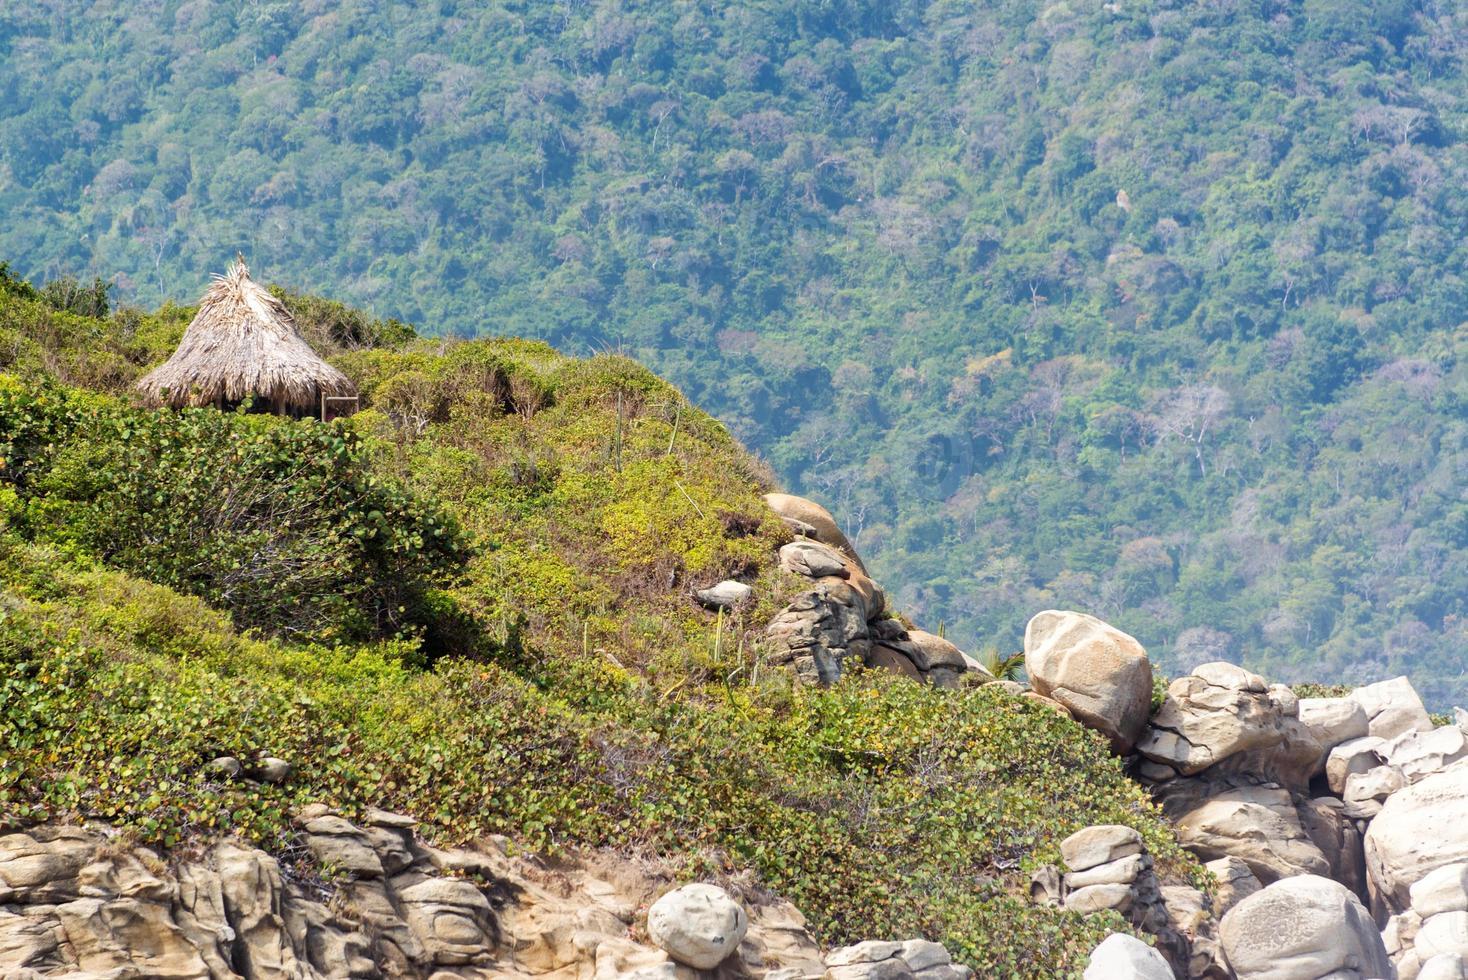 cabane de la jungle photo